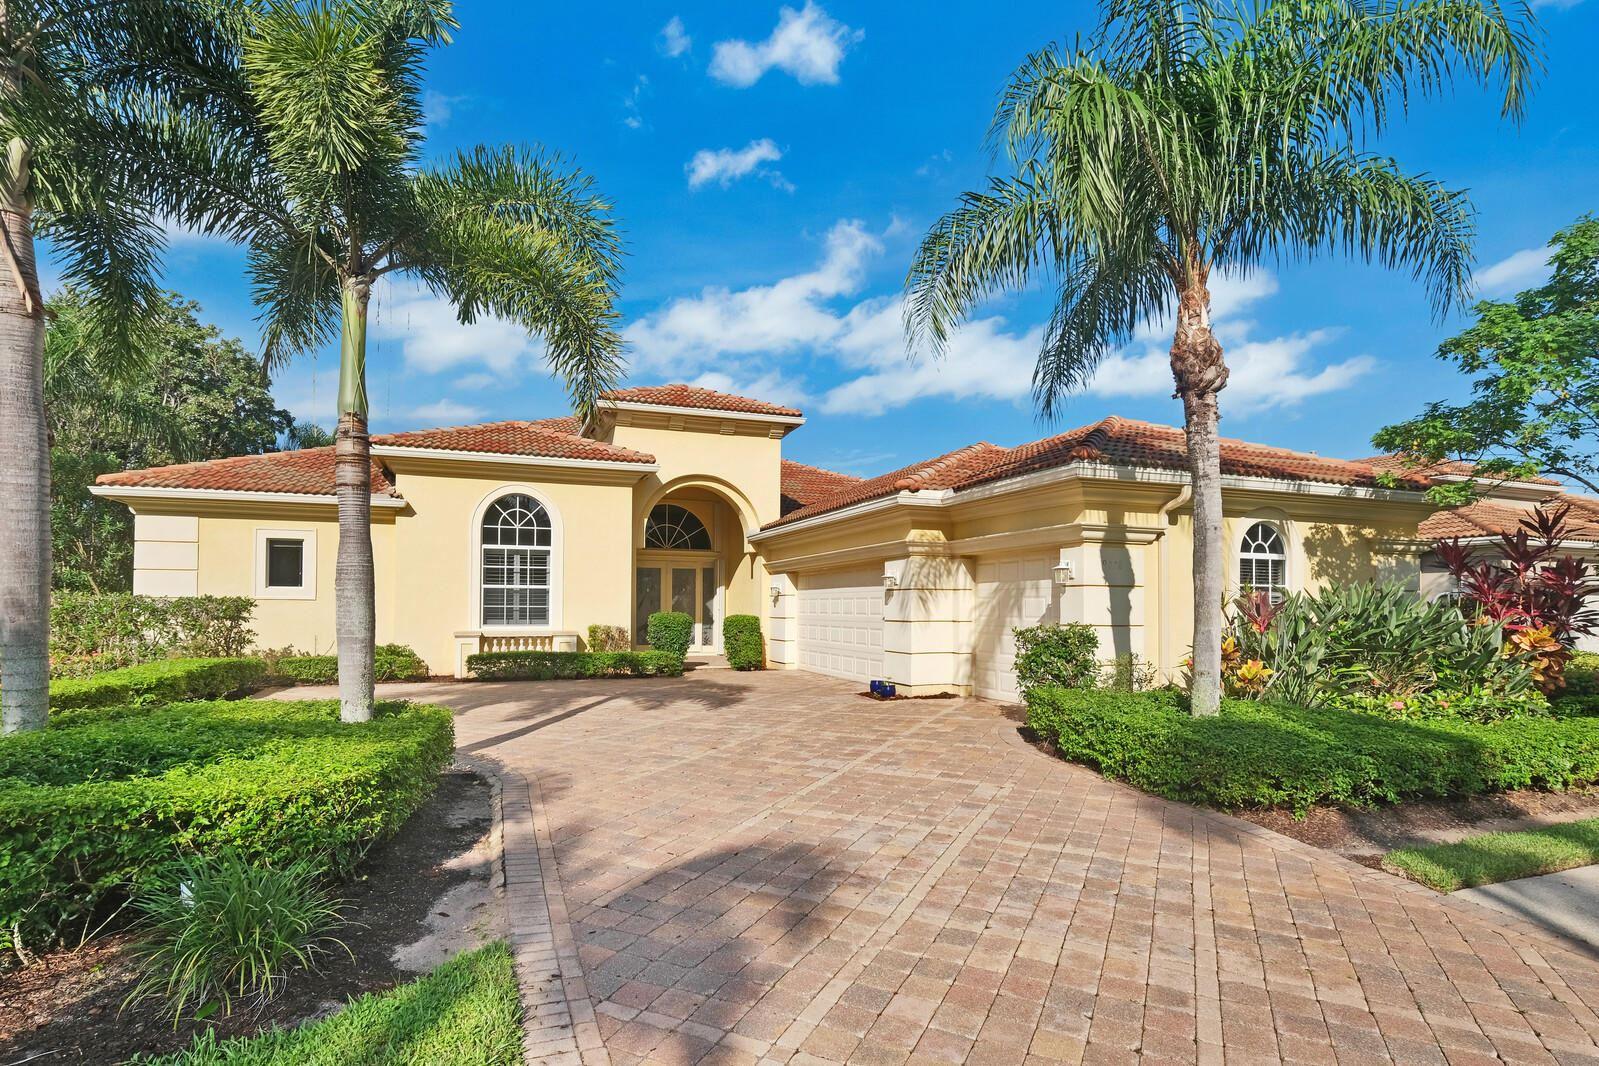 9008 Lakes Boulevard, West Palm Beach, FL 33412 - MLS#: RX-10737663